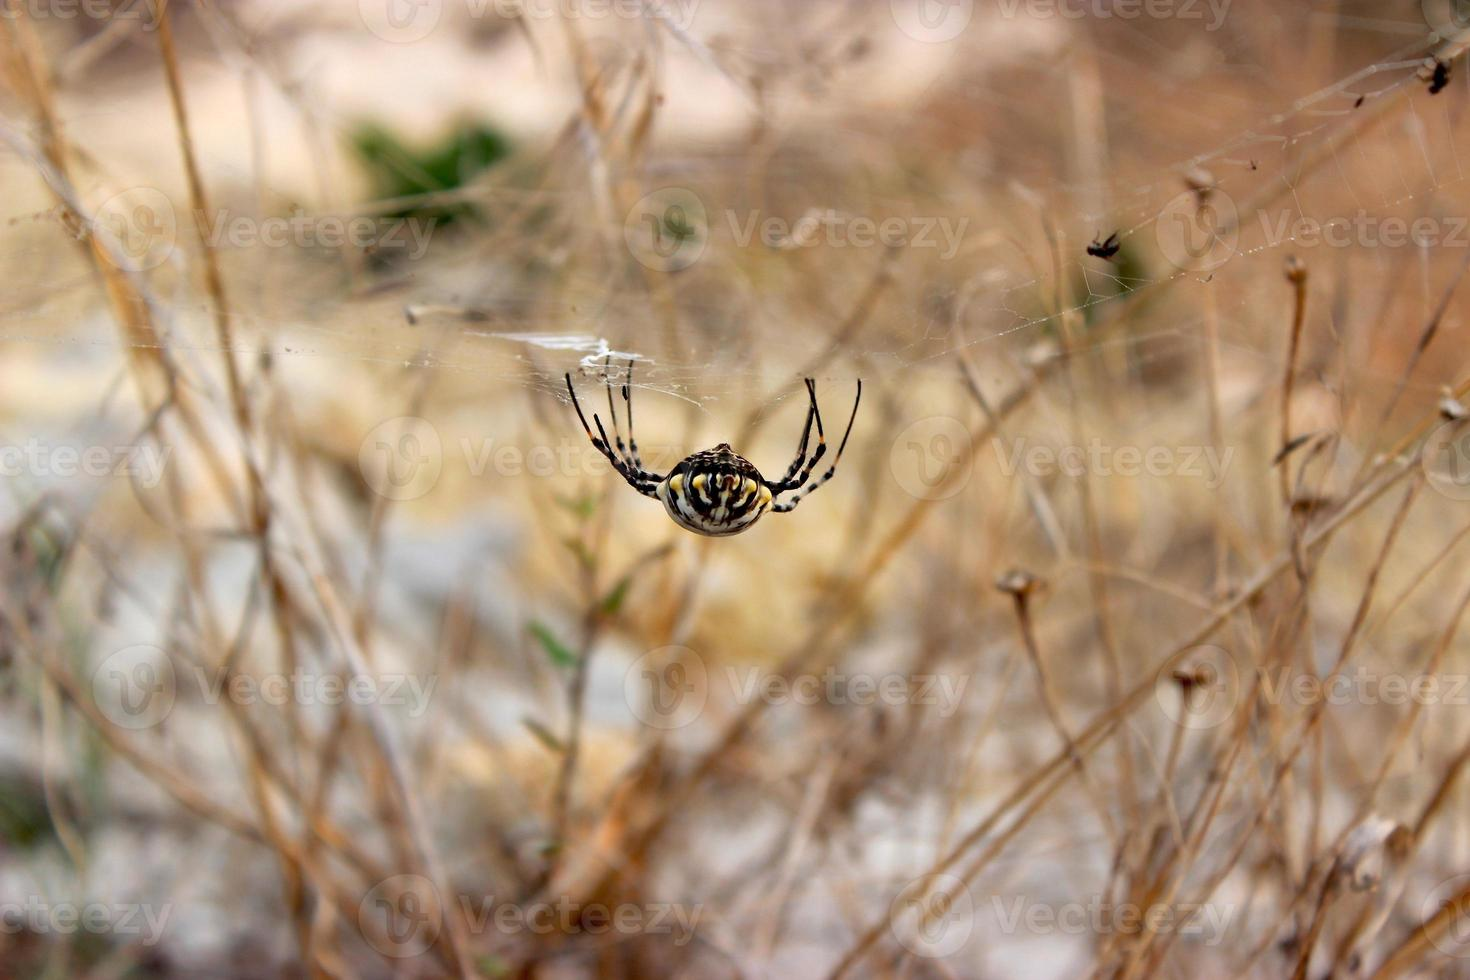 araignée souriante photo